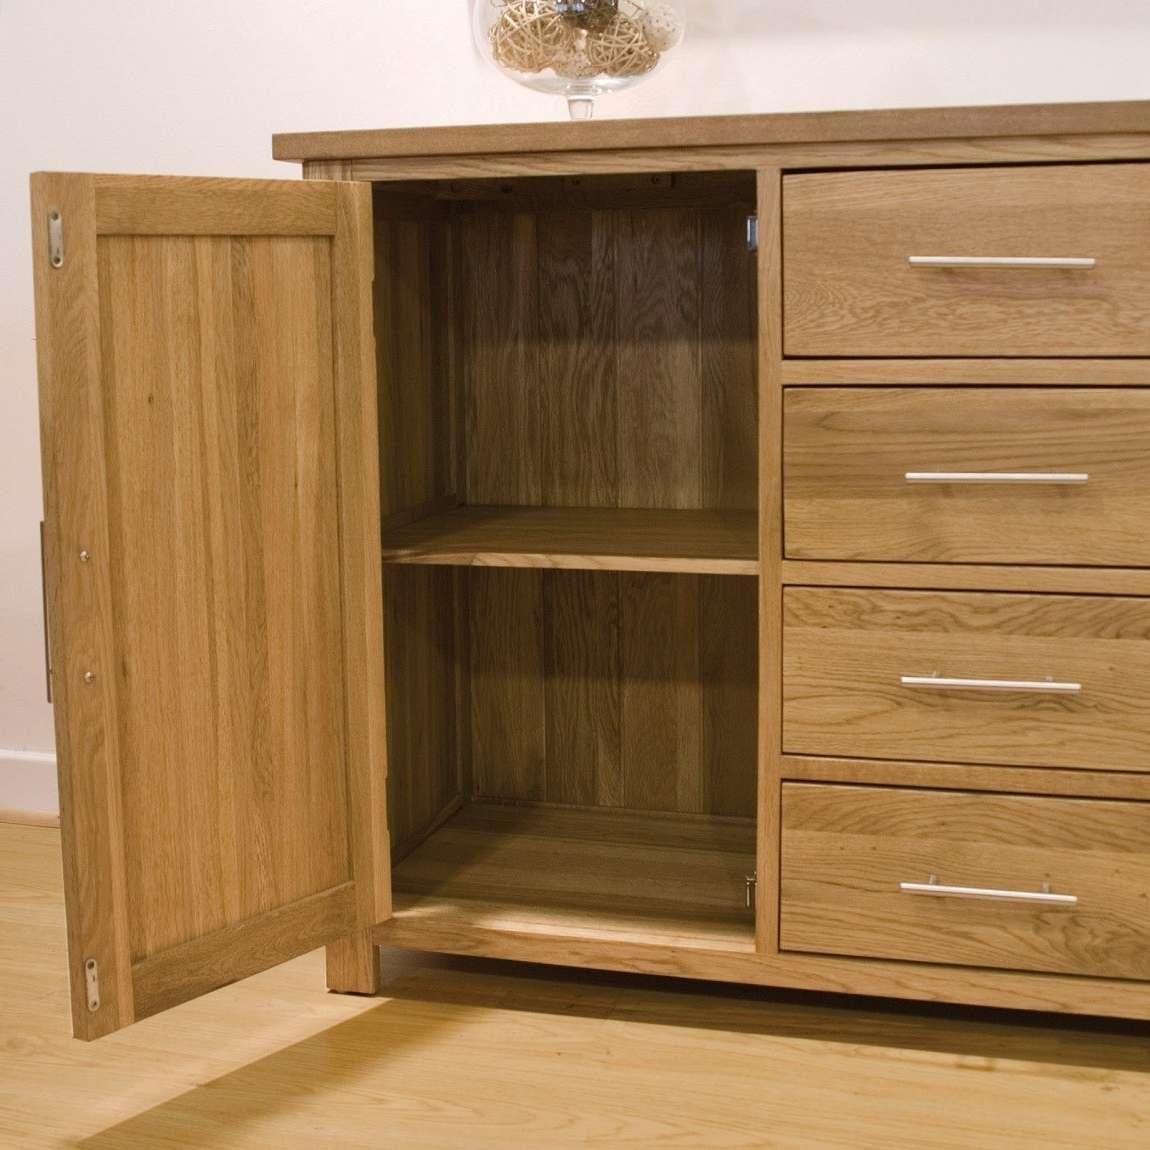 Opus Solid Oak Large 2 Door Sideboard | Oak Furniture Uk With Regard To 2 Door Sideboards (Gallery 16 of 20)